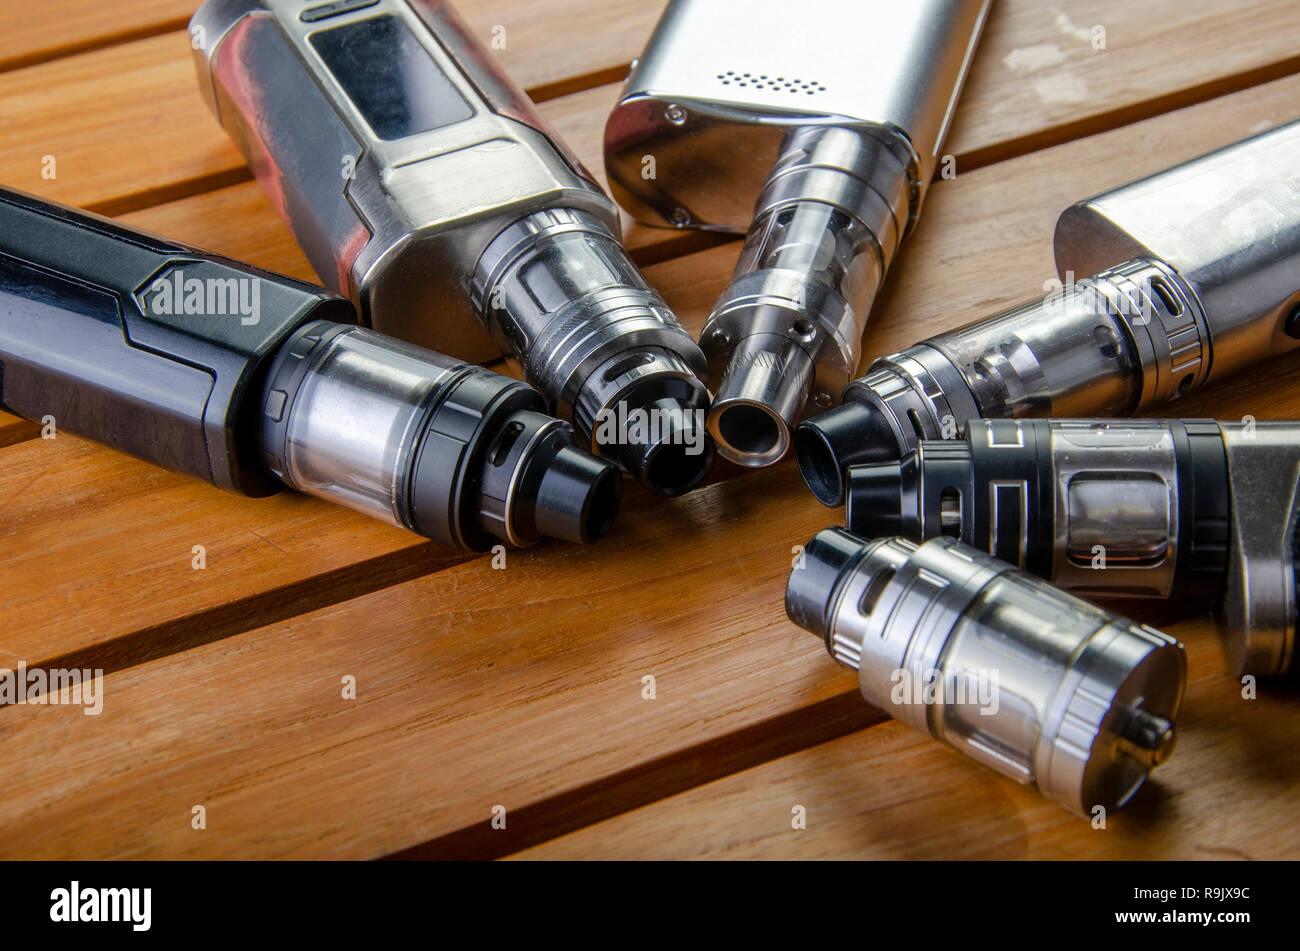 Popular vaping e cig devices mod.electronic cigarette over wooden background. vaporizer e-cig old device model. Stock Photo